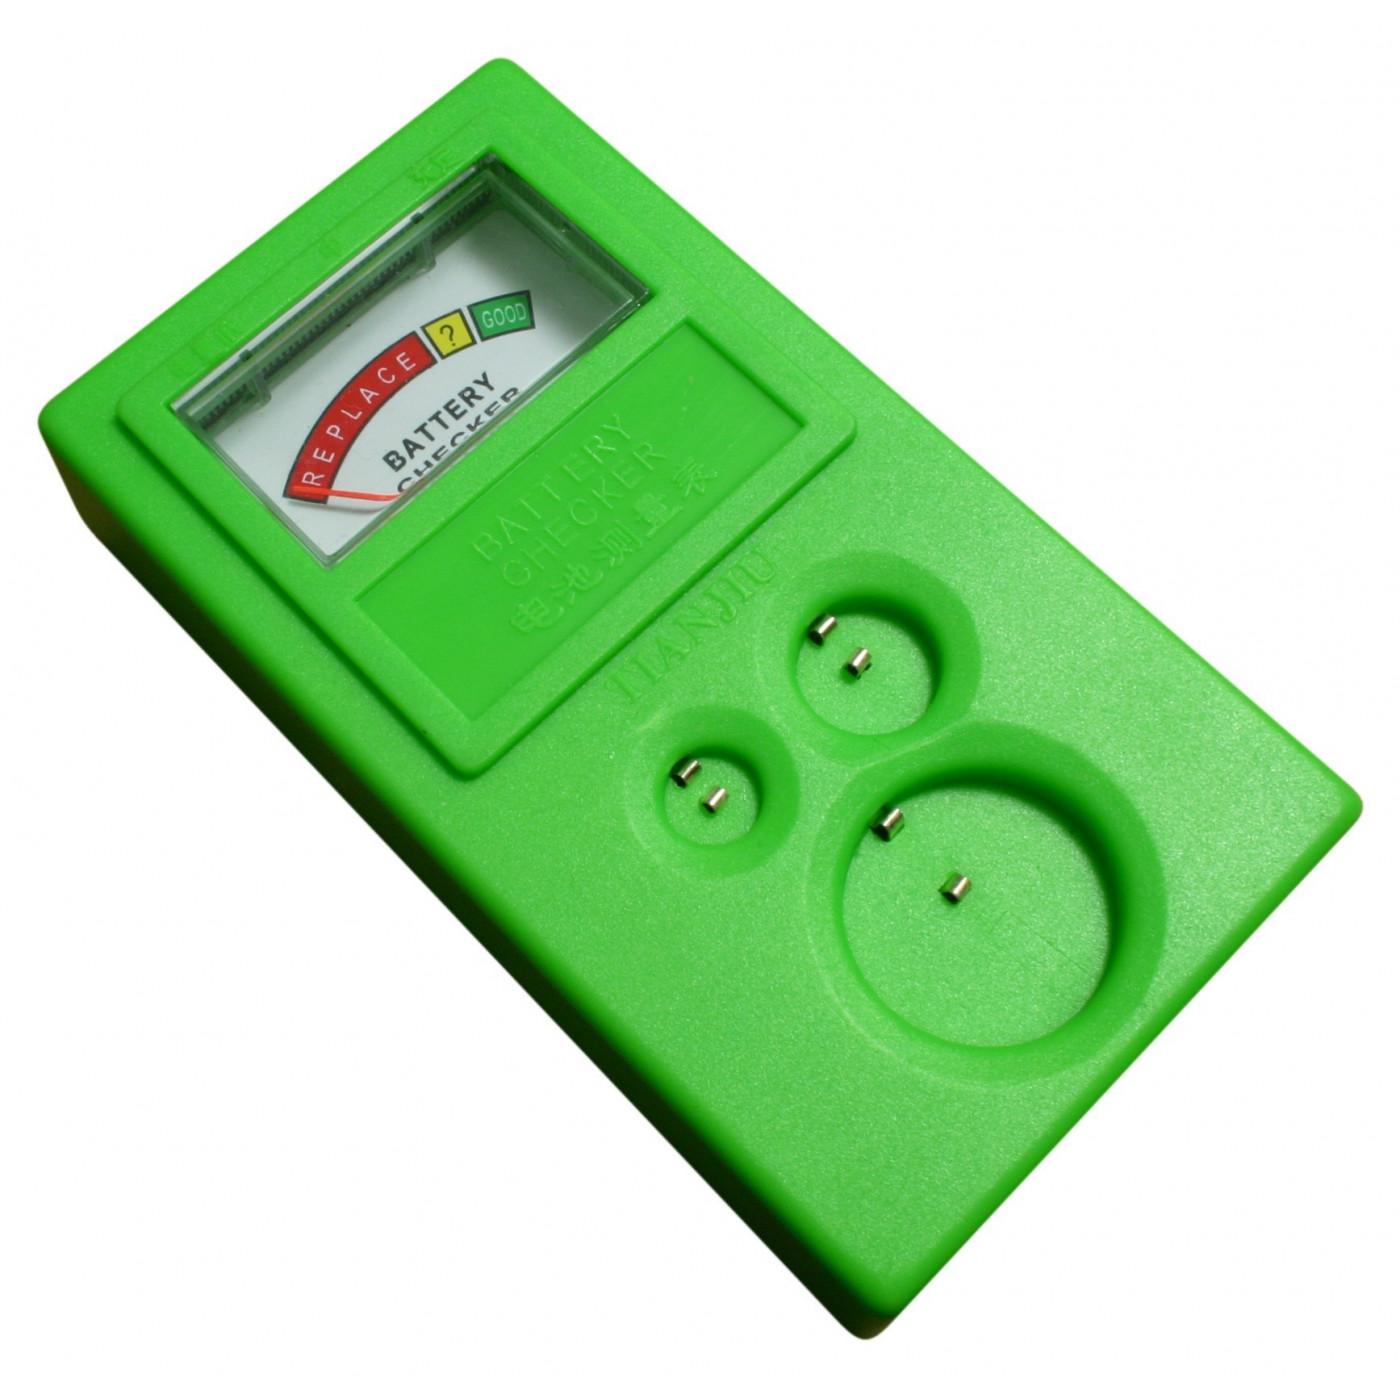 Tester batteria per batterie a bottone